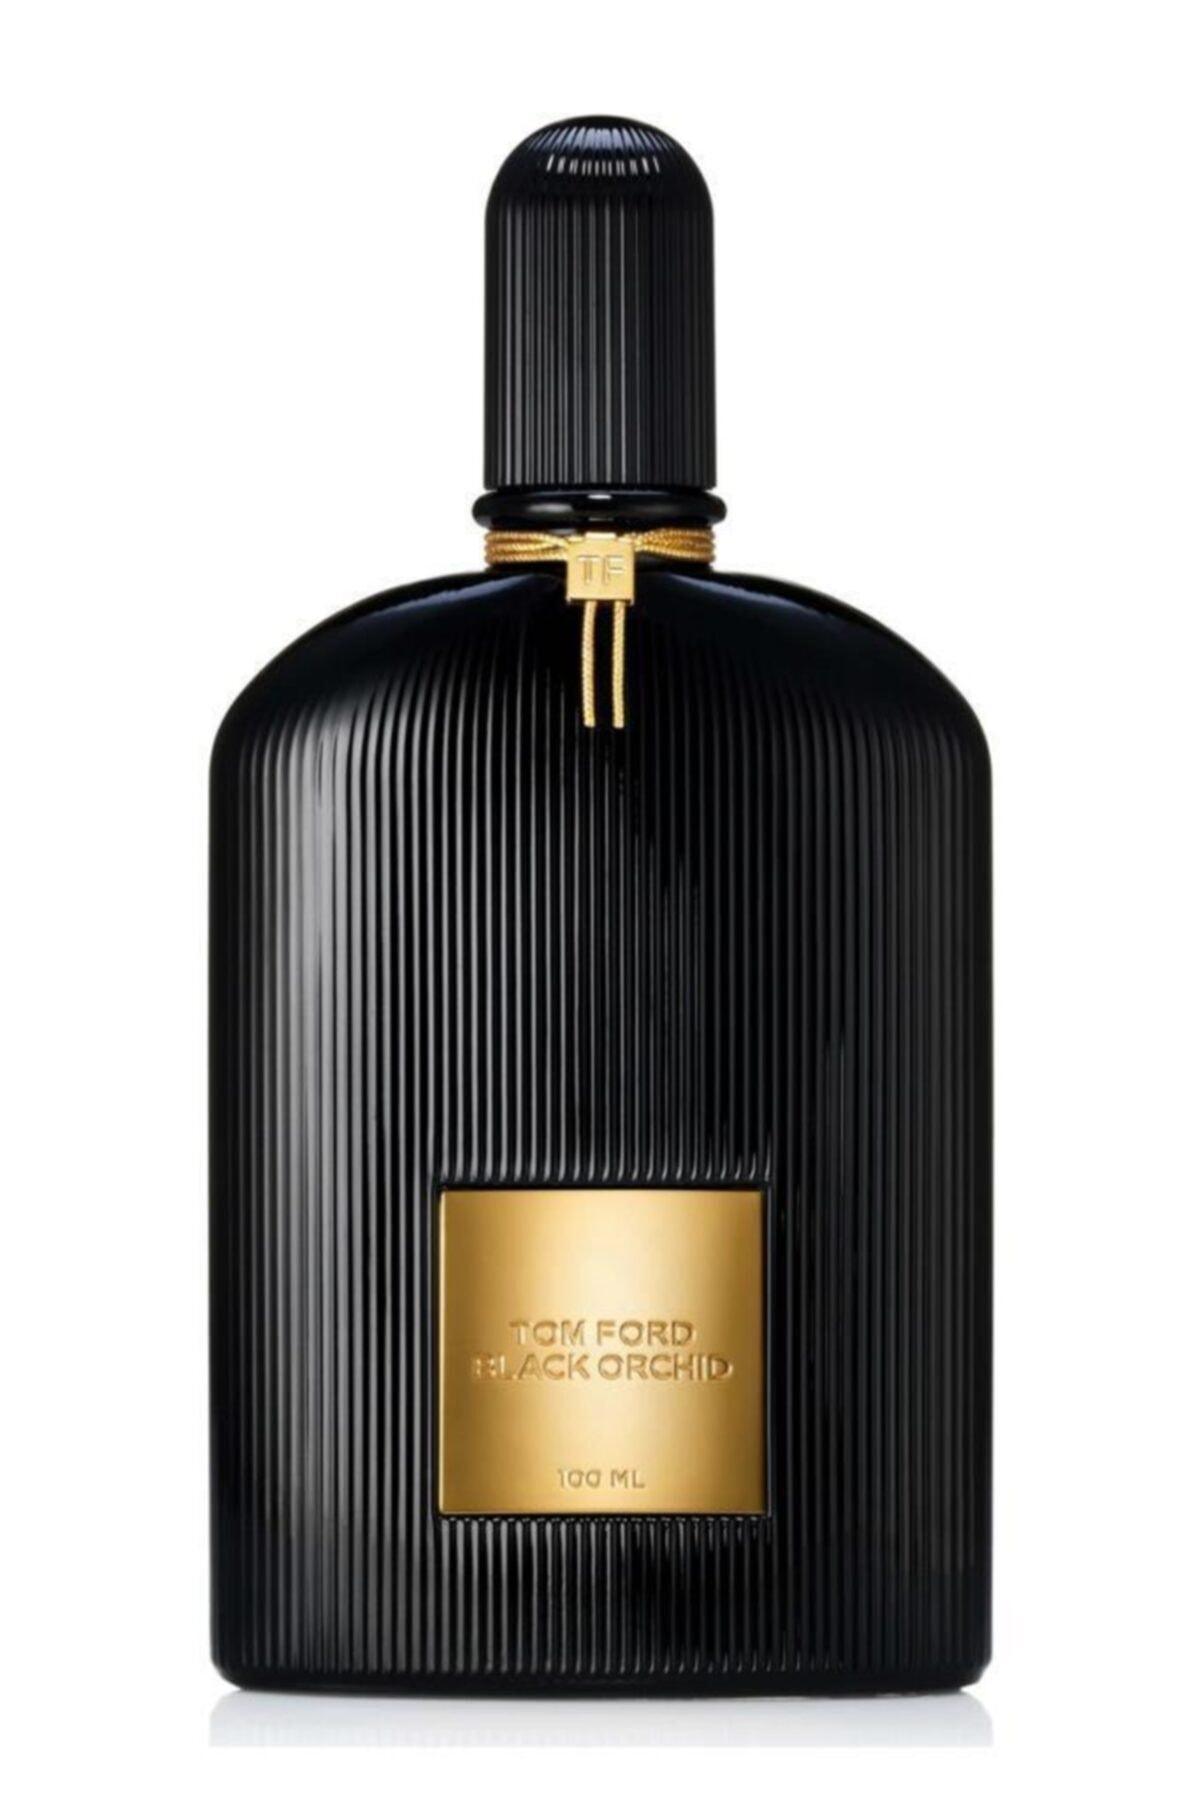 Tom Ford Black Orchid Edp 100 ml 1